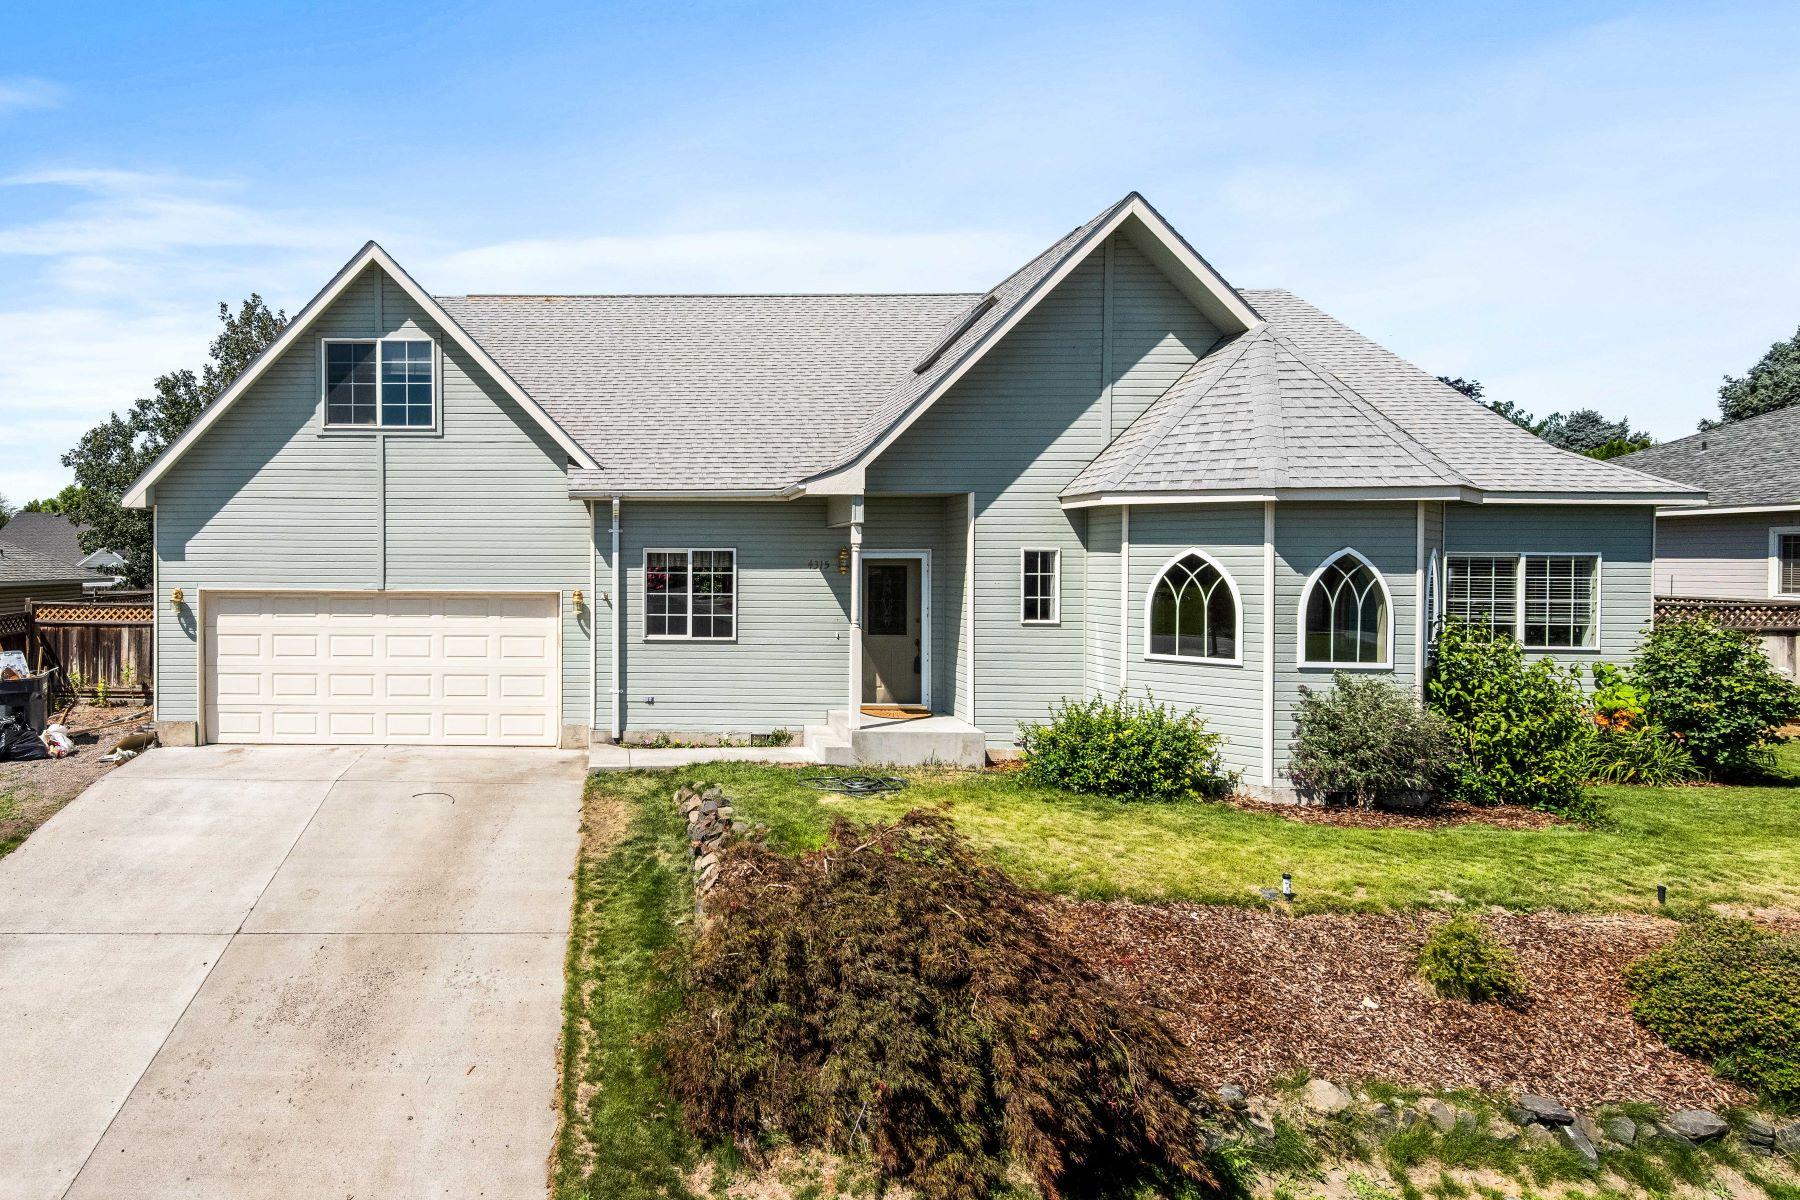 Single Family Homes for Sale at Hello Beautiful! Custom build & original owner! 4315 Desert Plateau Drive Pasco, Washington 99301 United States